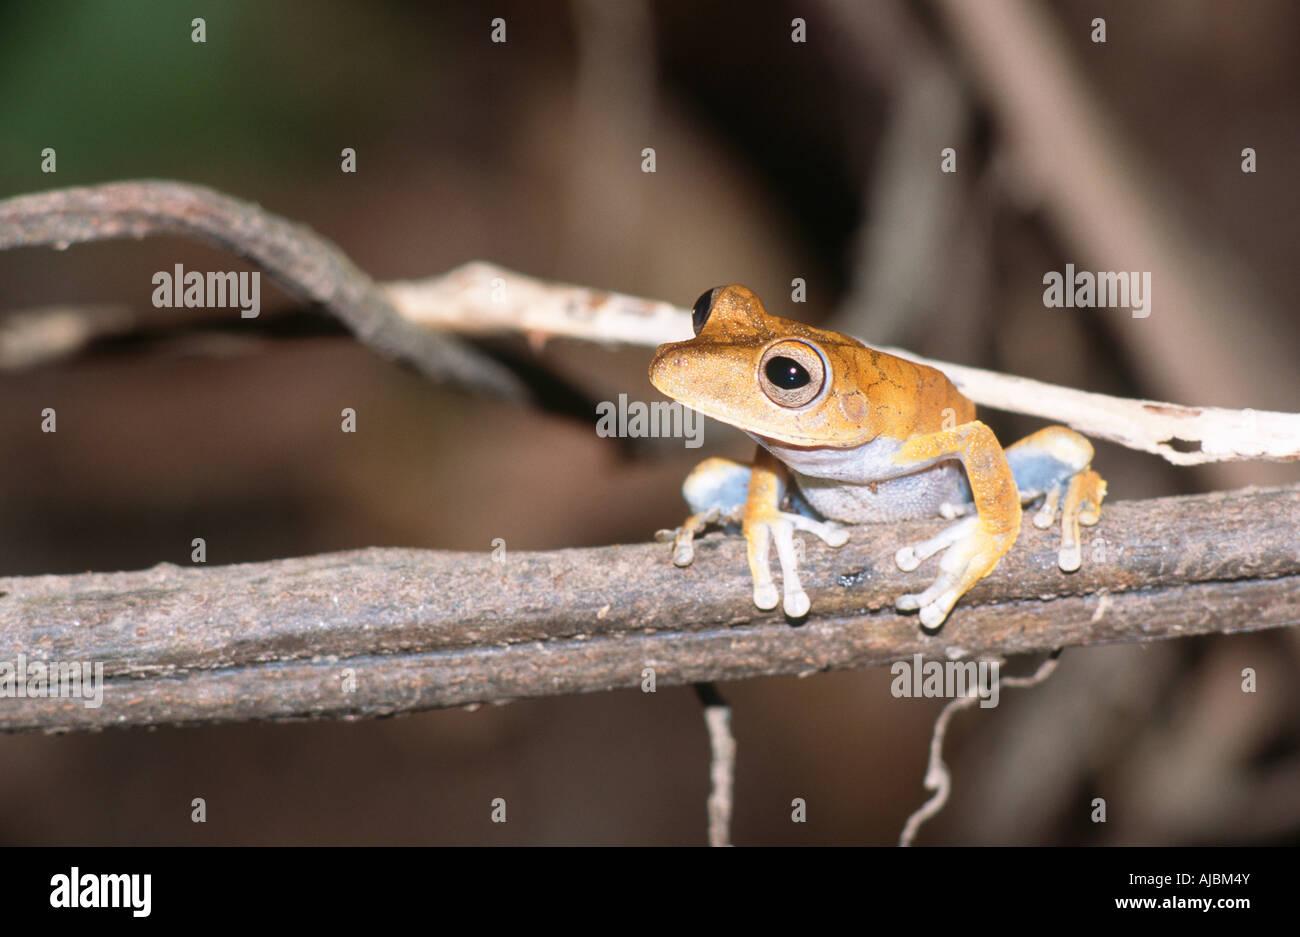 Frog Observation Imágenes De Stock & Frog Observation Fotos De Stock ...